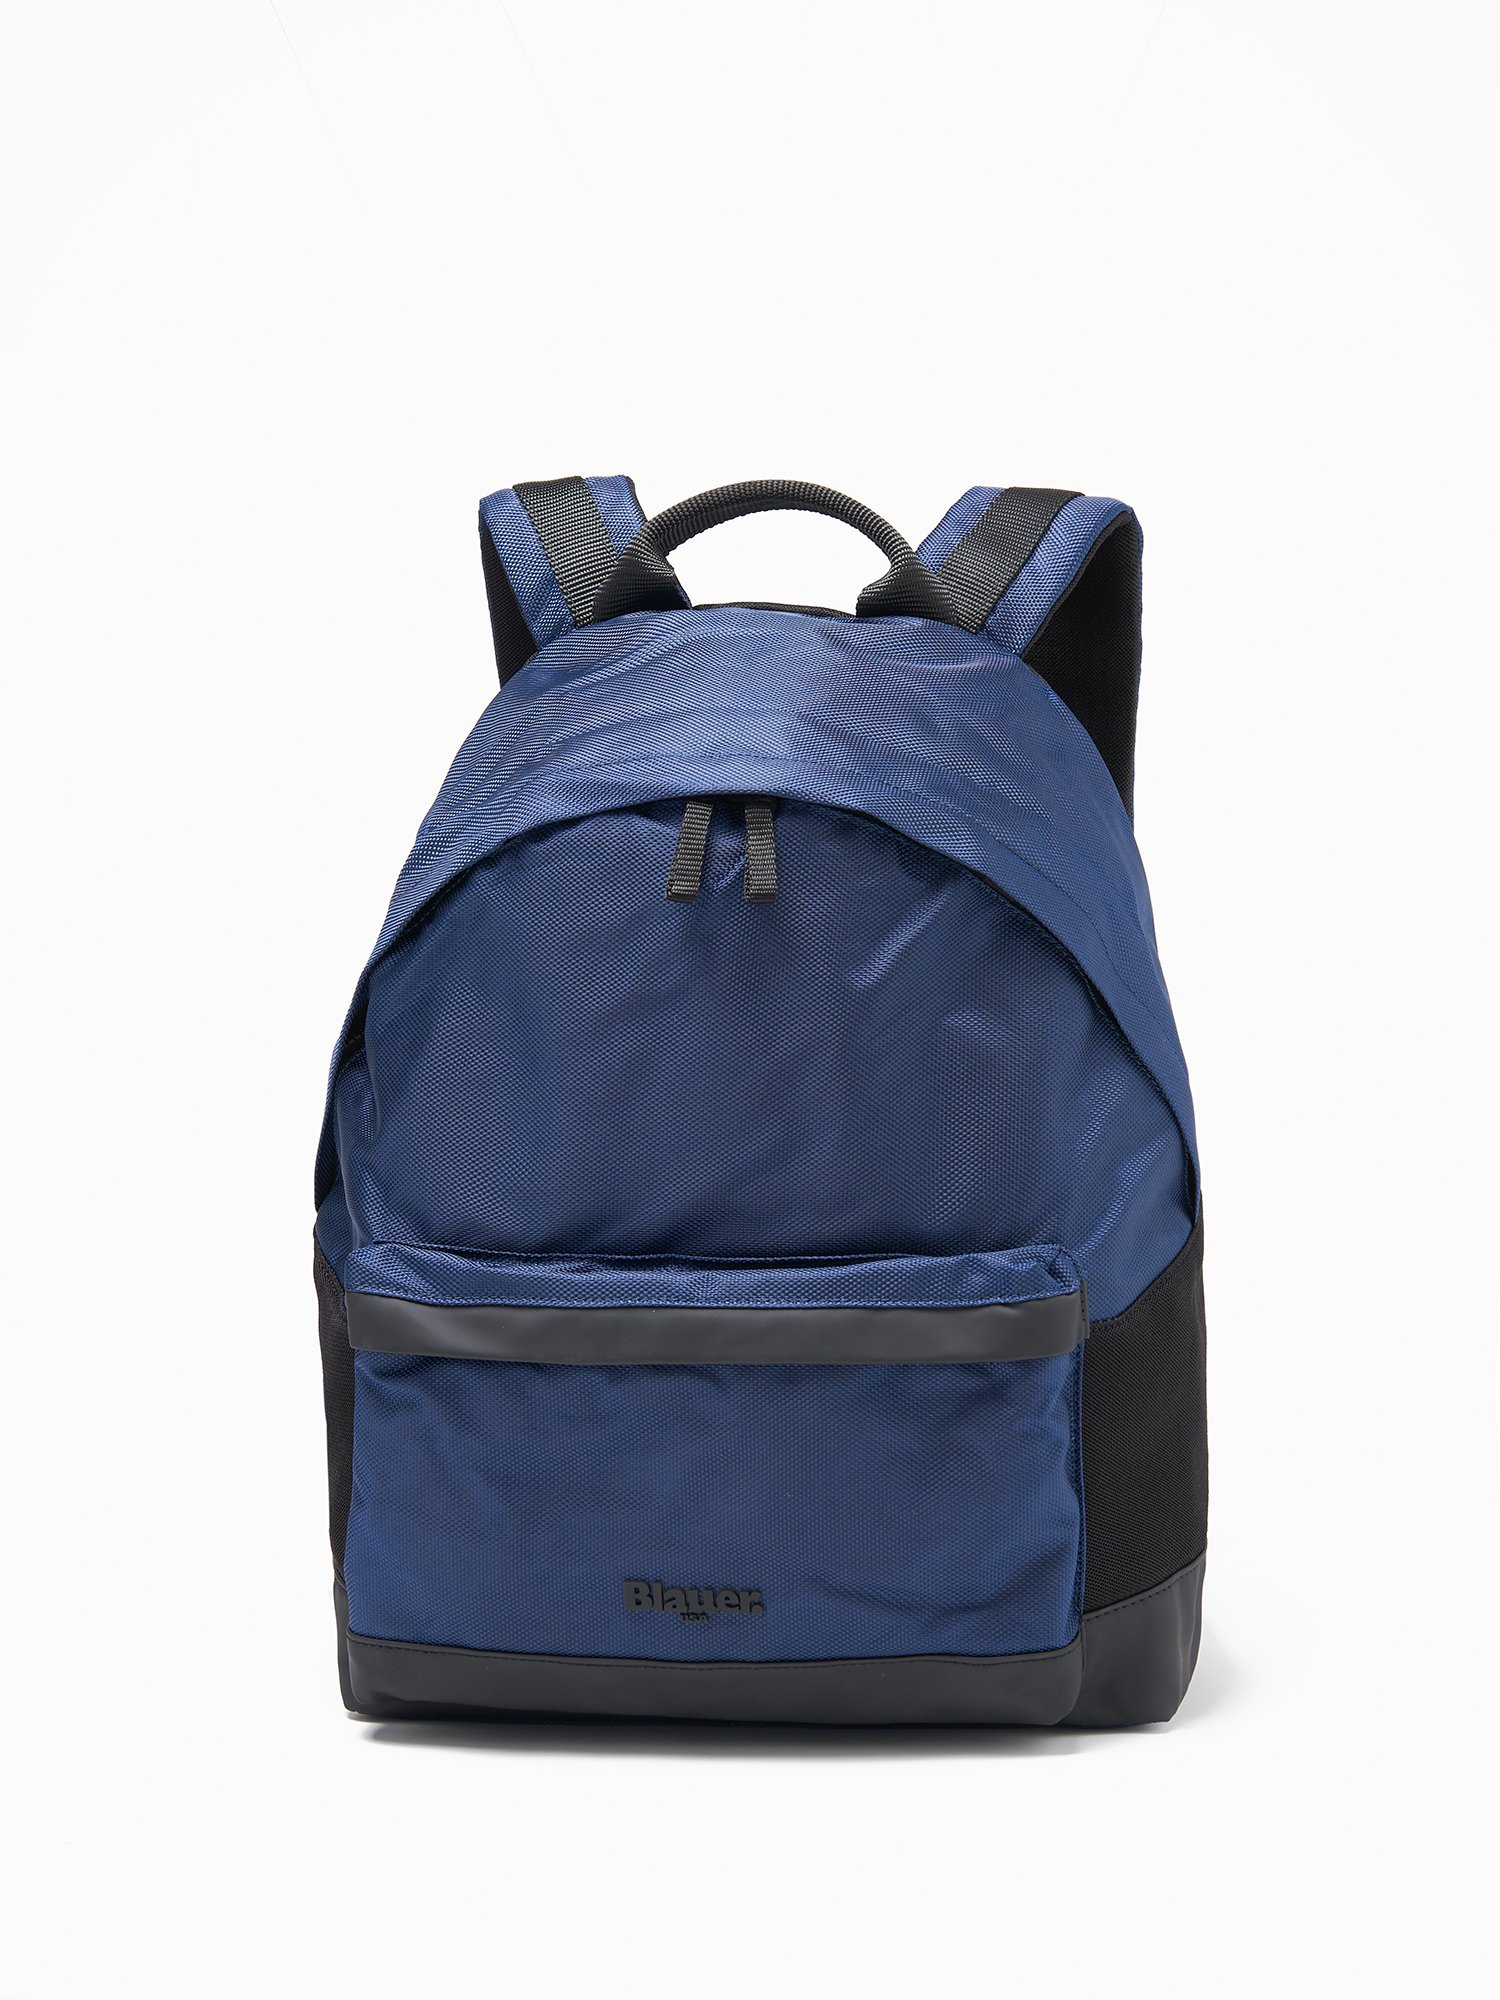 CLASSIC BACKPACK - Blauer